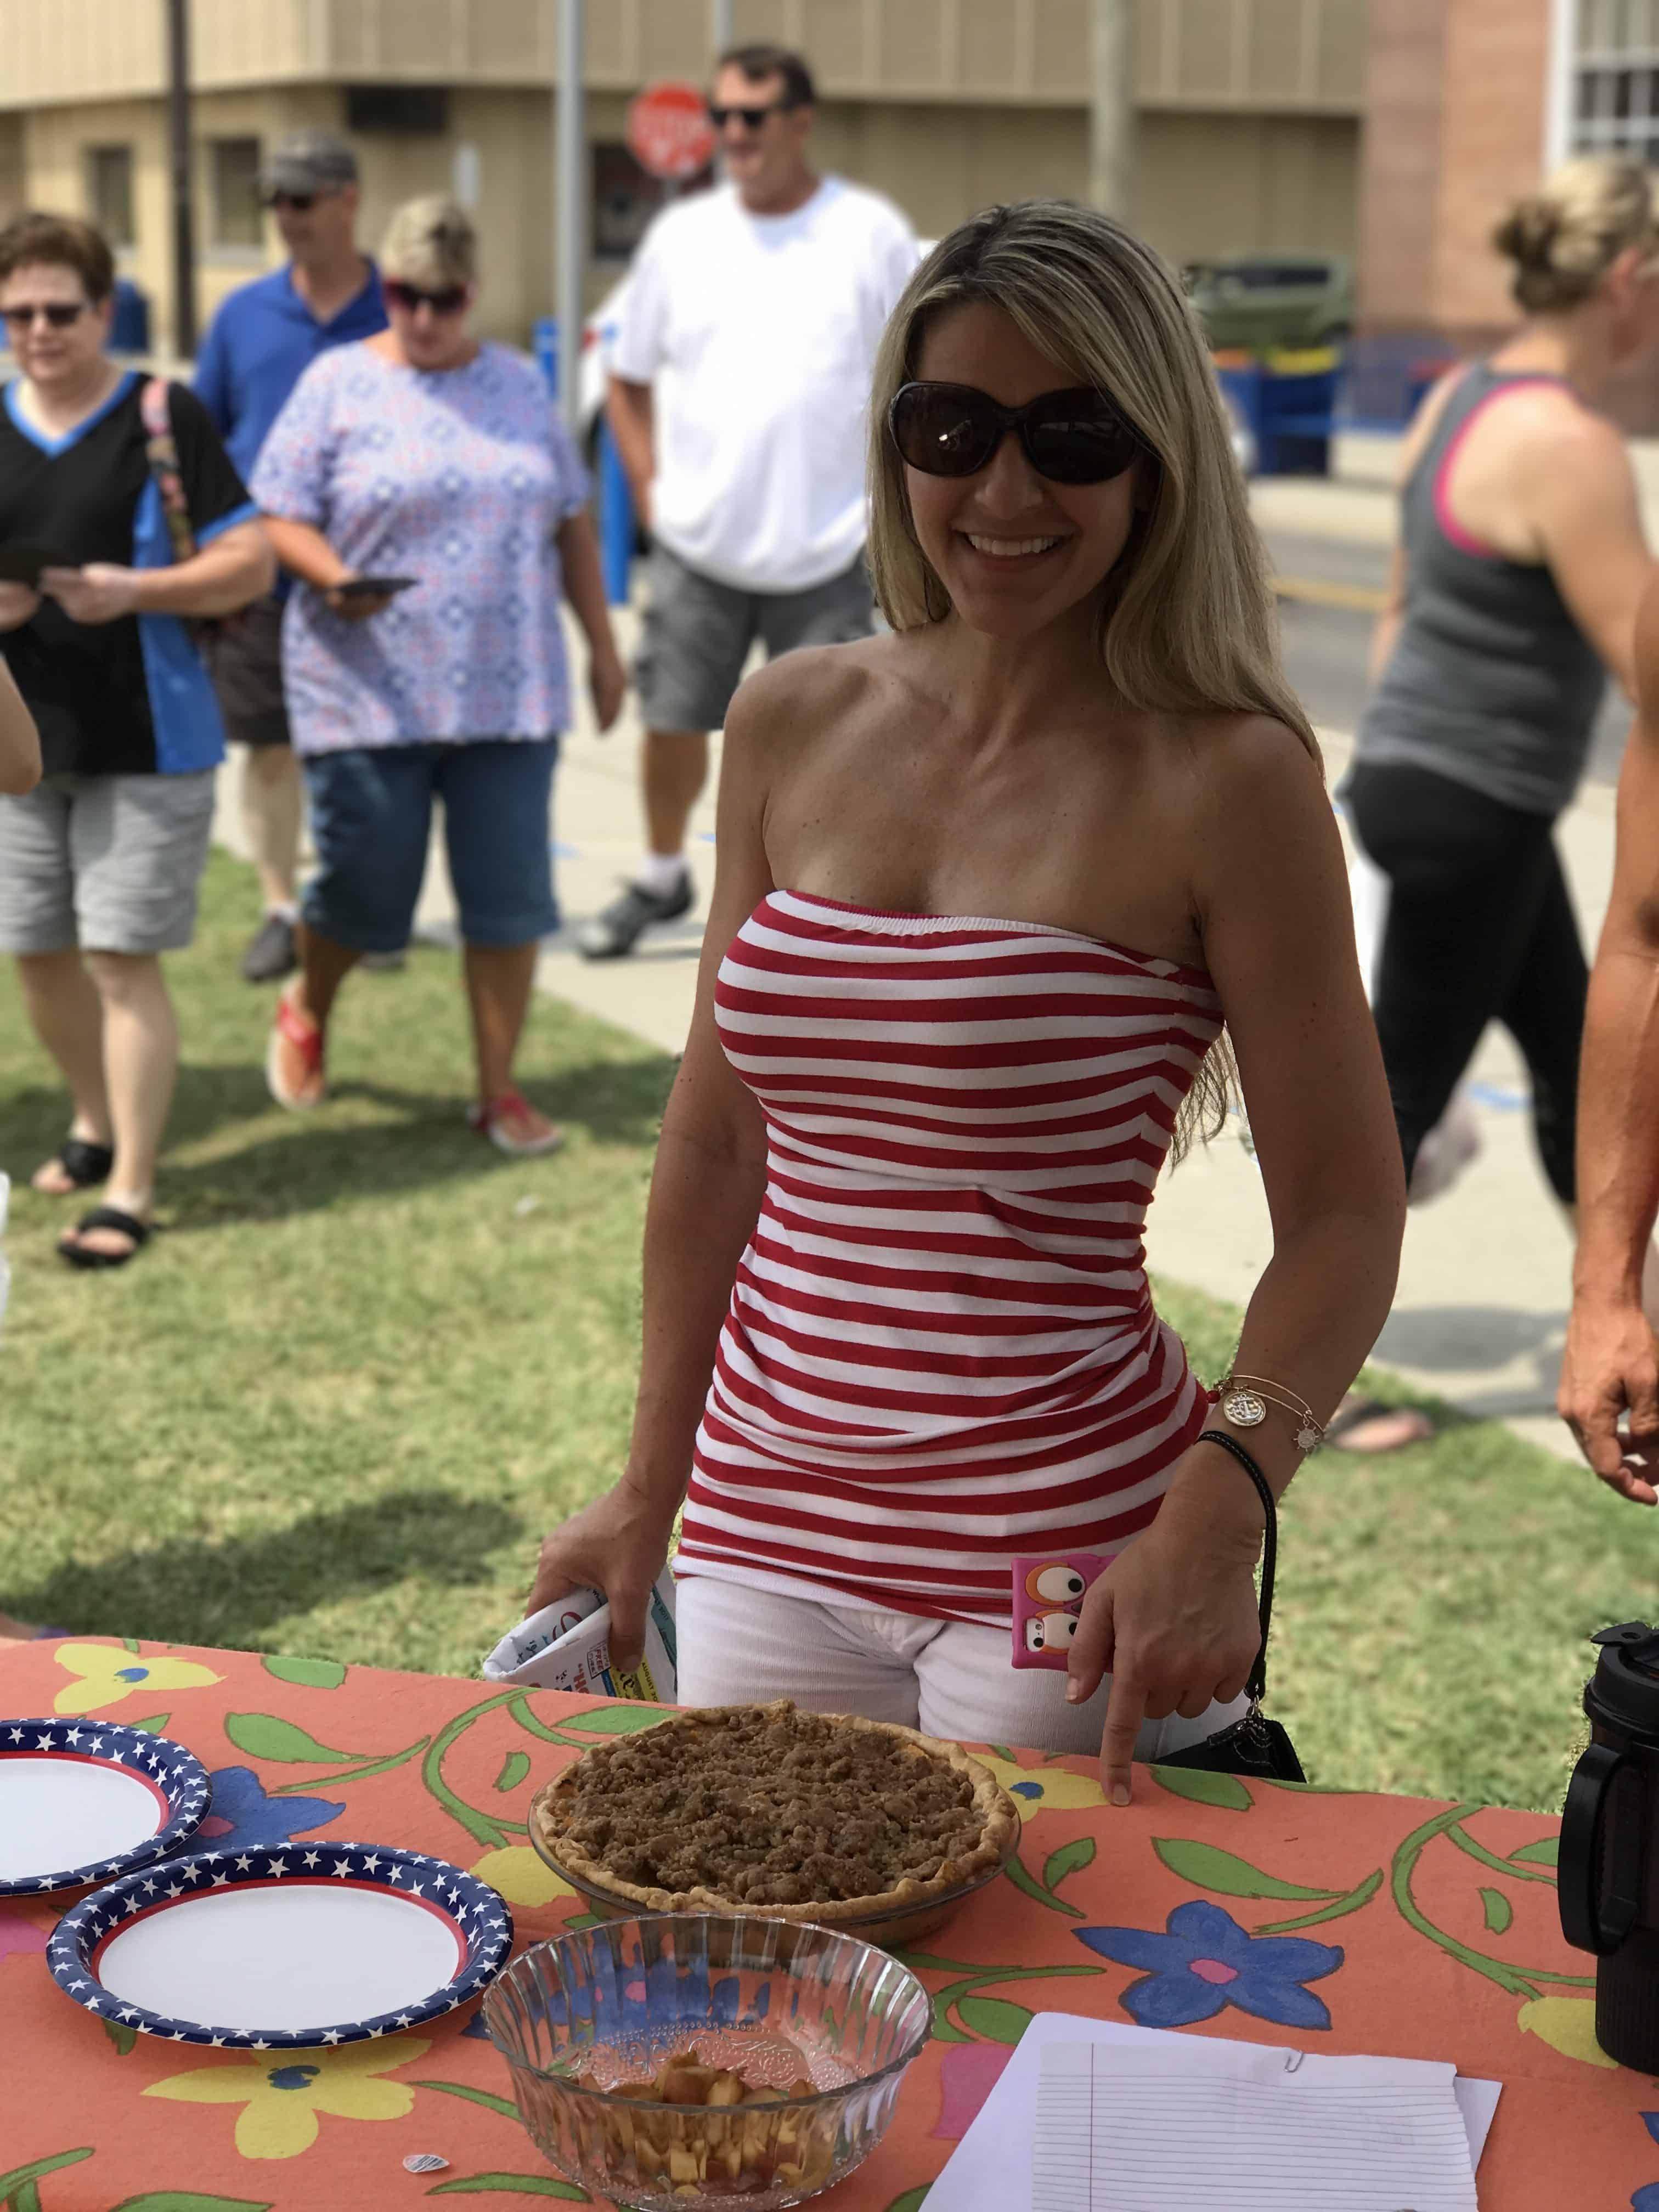 Downtown Wildwood Annual Peach Pie Baking Contest Announced